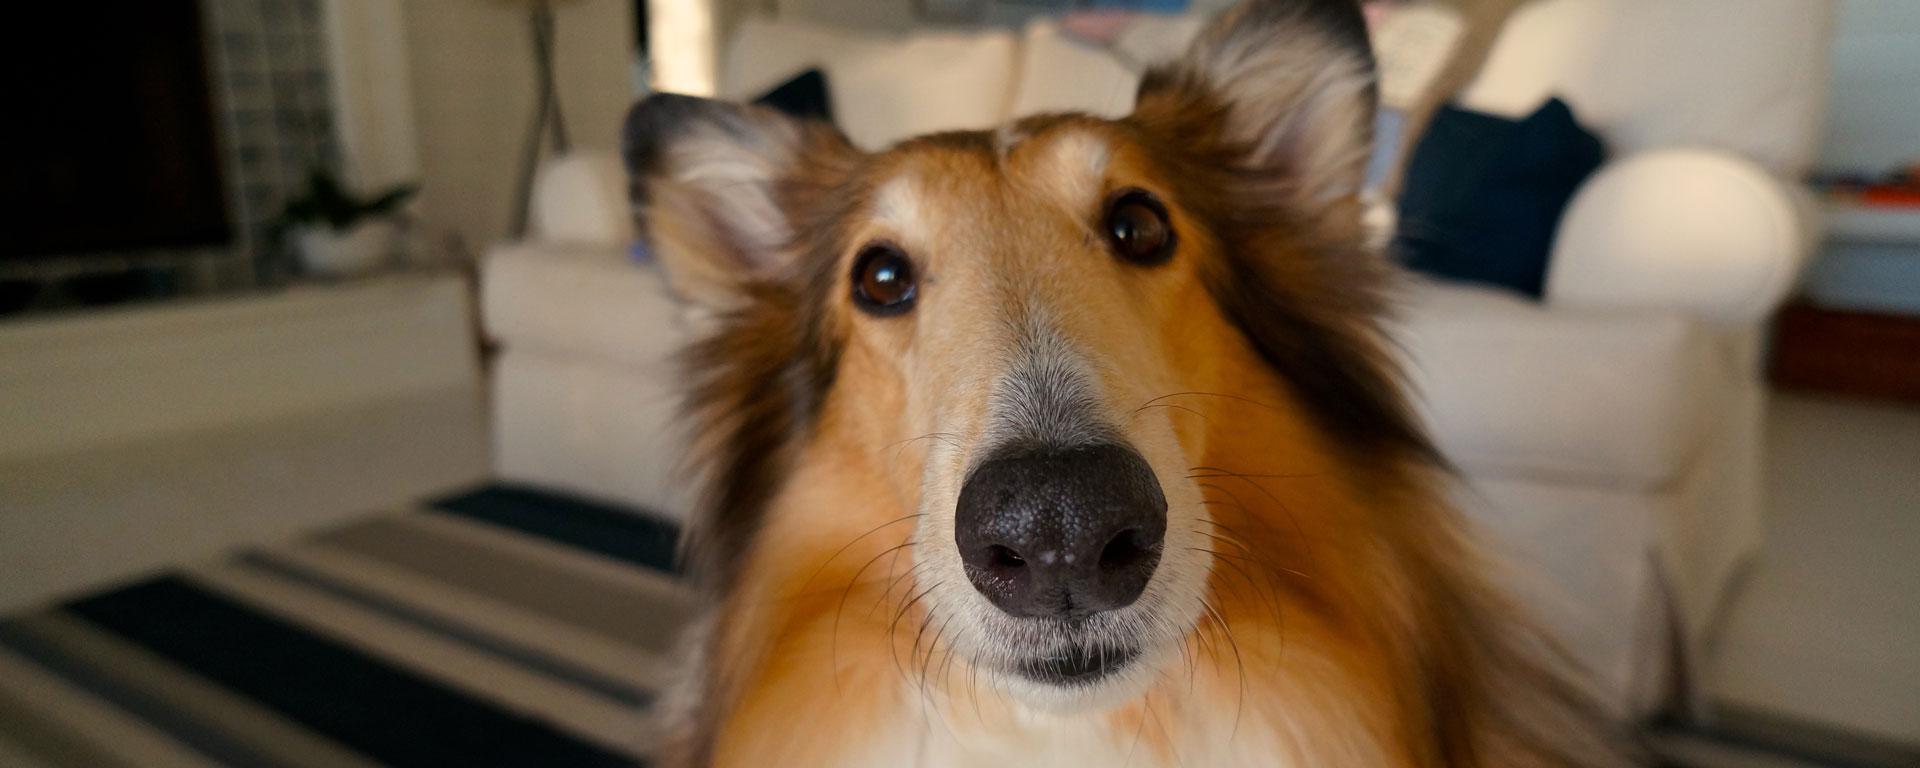 doncharisma.org-dog-pet-cute-doggy-little-happy-pb-705820-1920x768